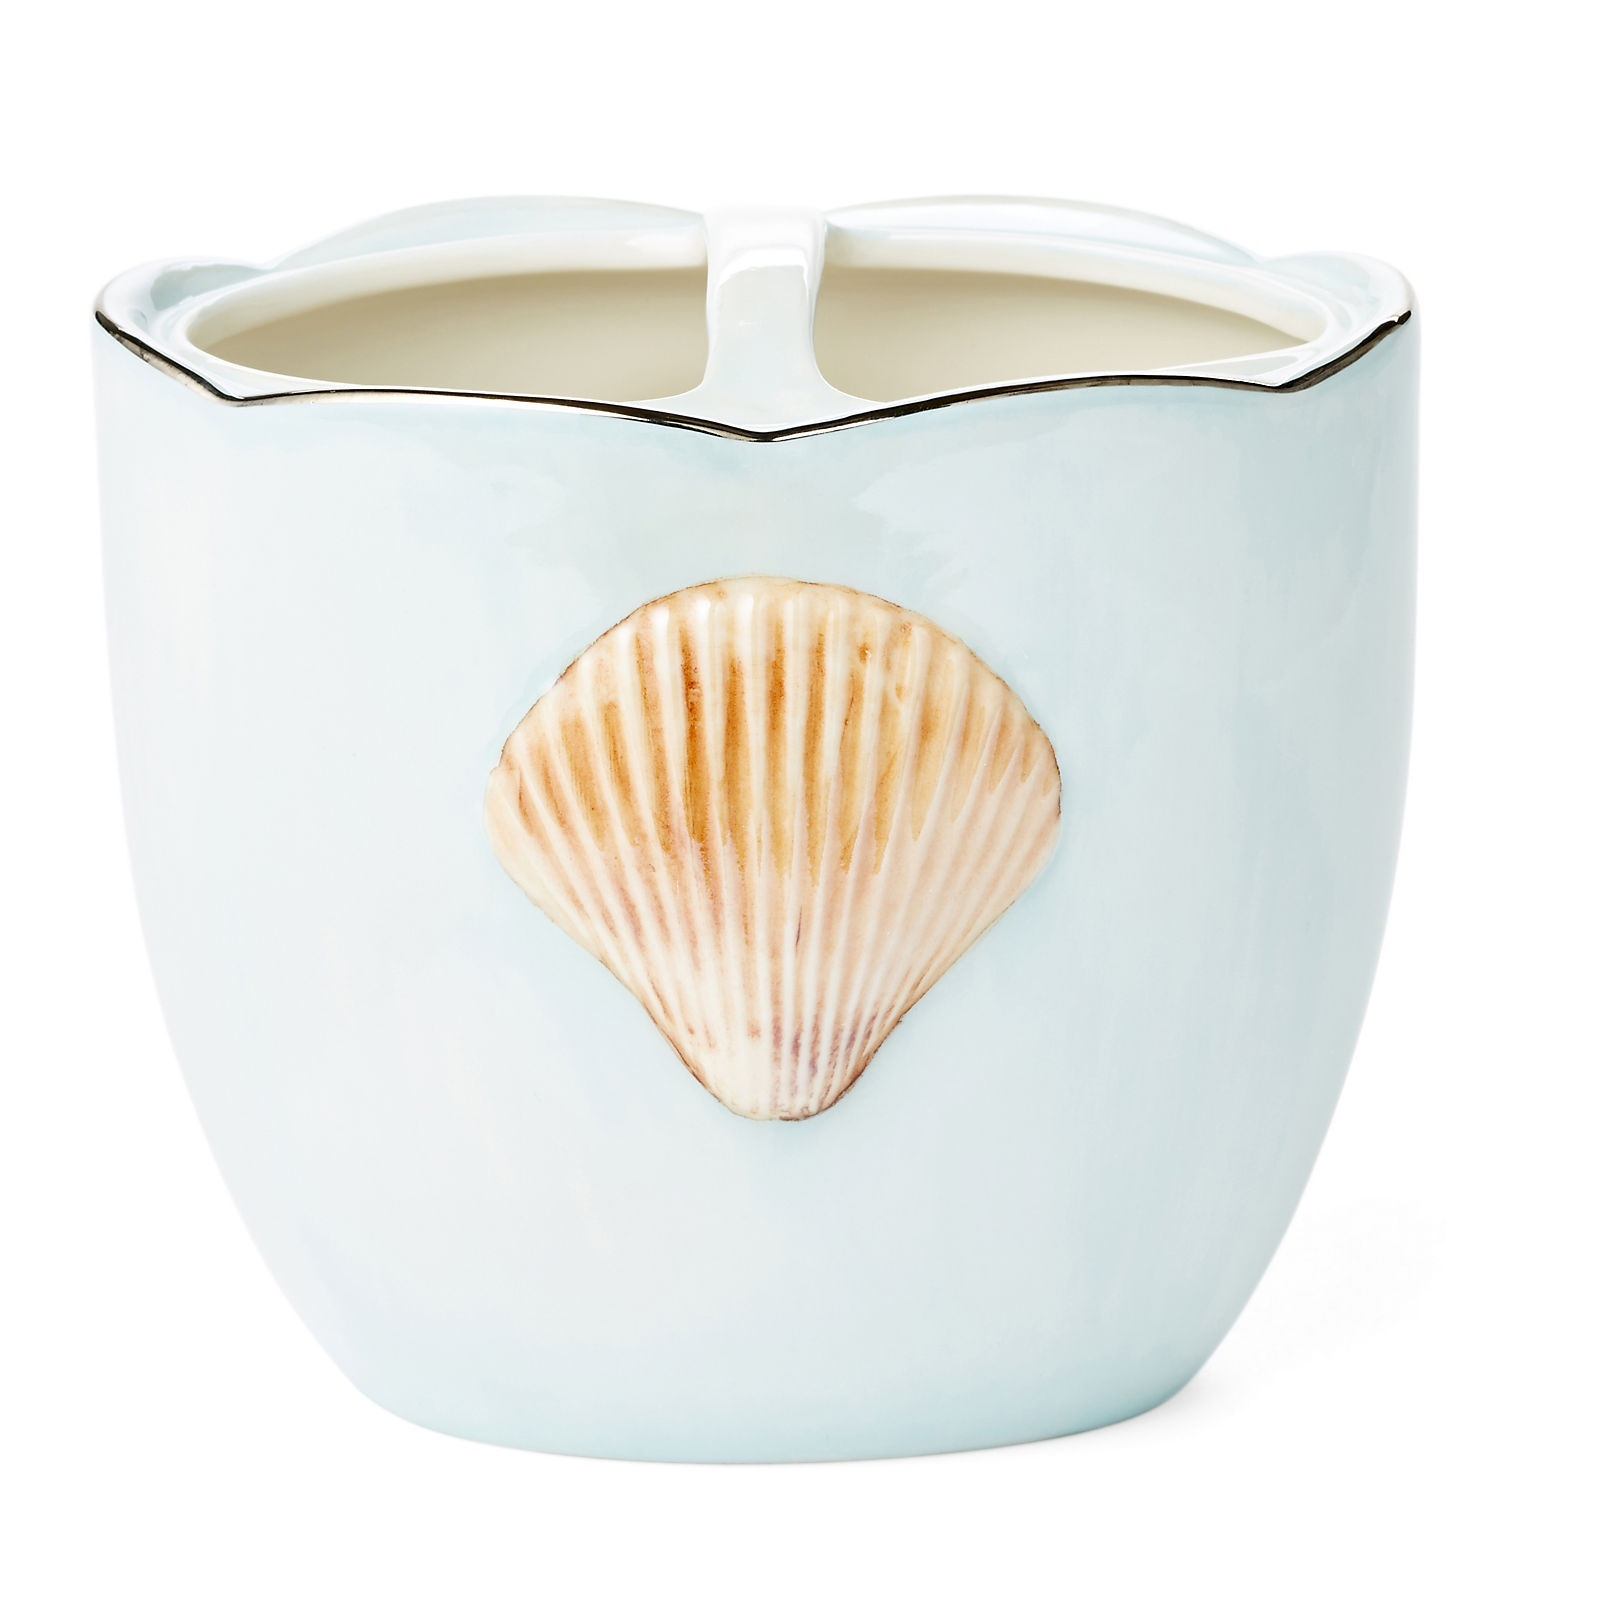 Стаканы для щеток Стакан для зубных щёток Kassatex Mare Shells Seafoam stakan-dlya-zubnih-shyotok-mare-shells-seafoam-ot-kassatex-ssha-kitay.jpg